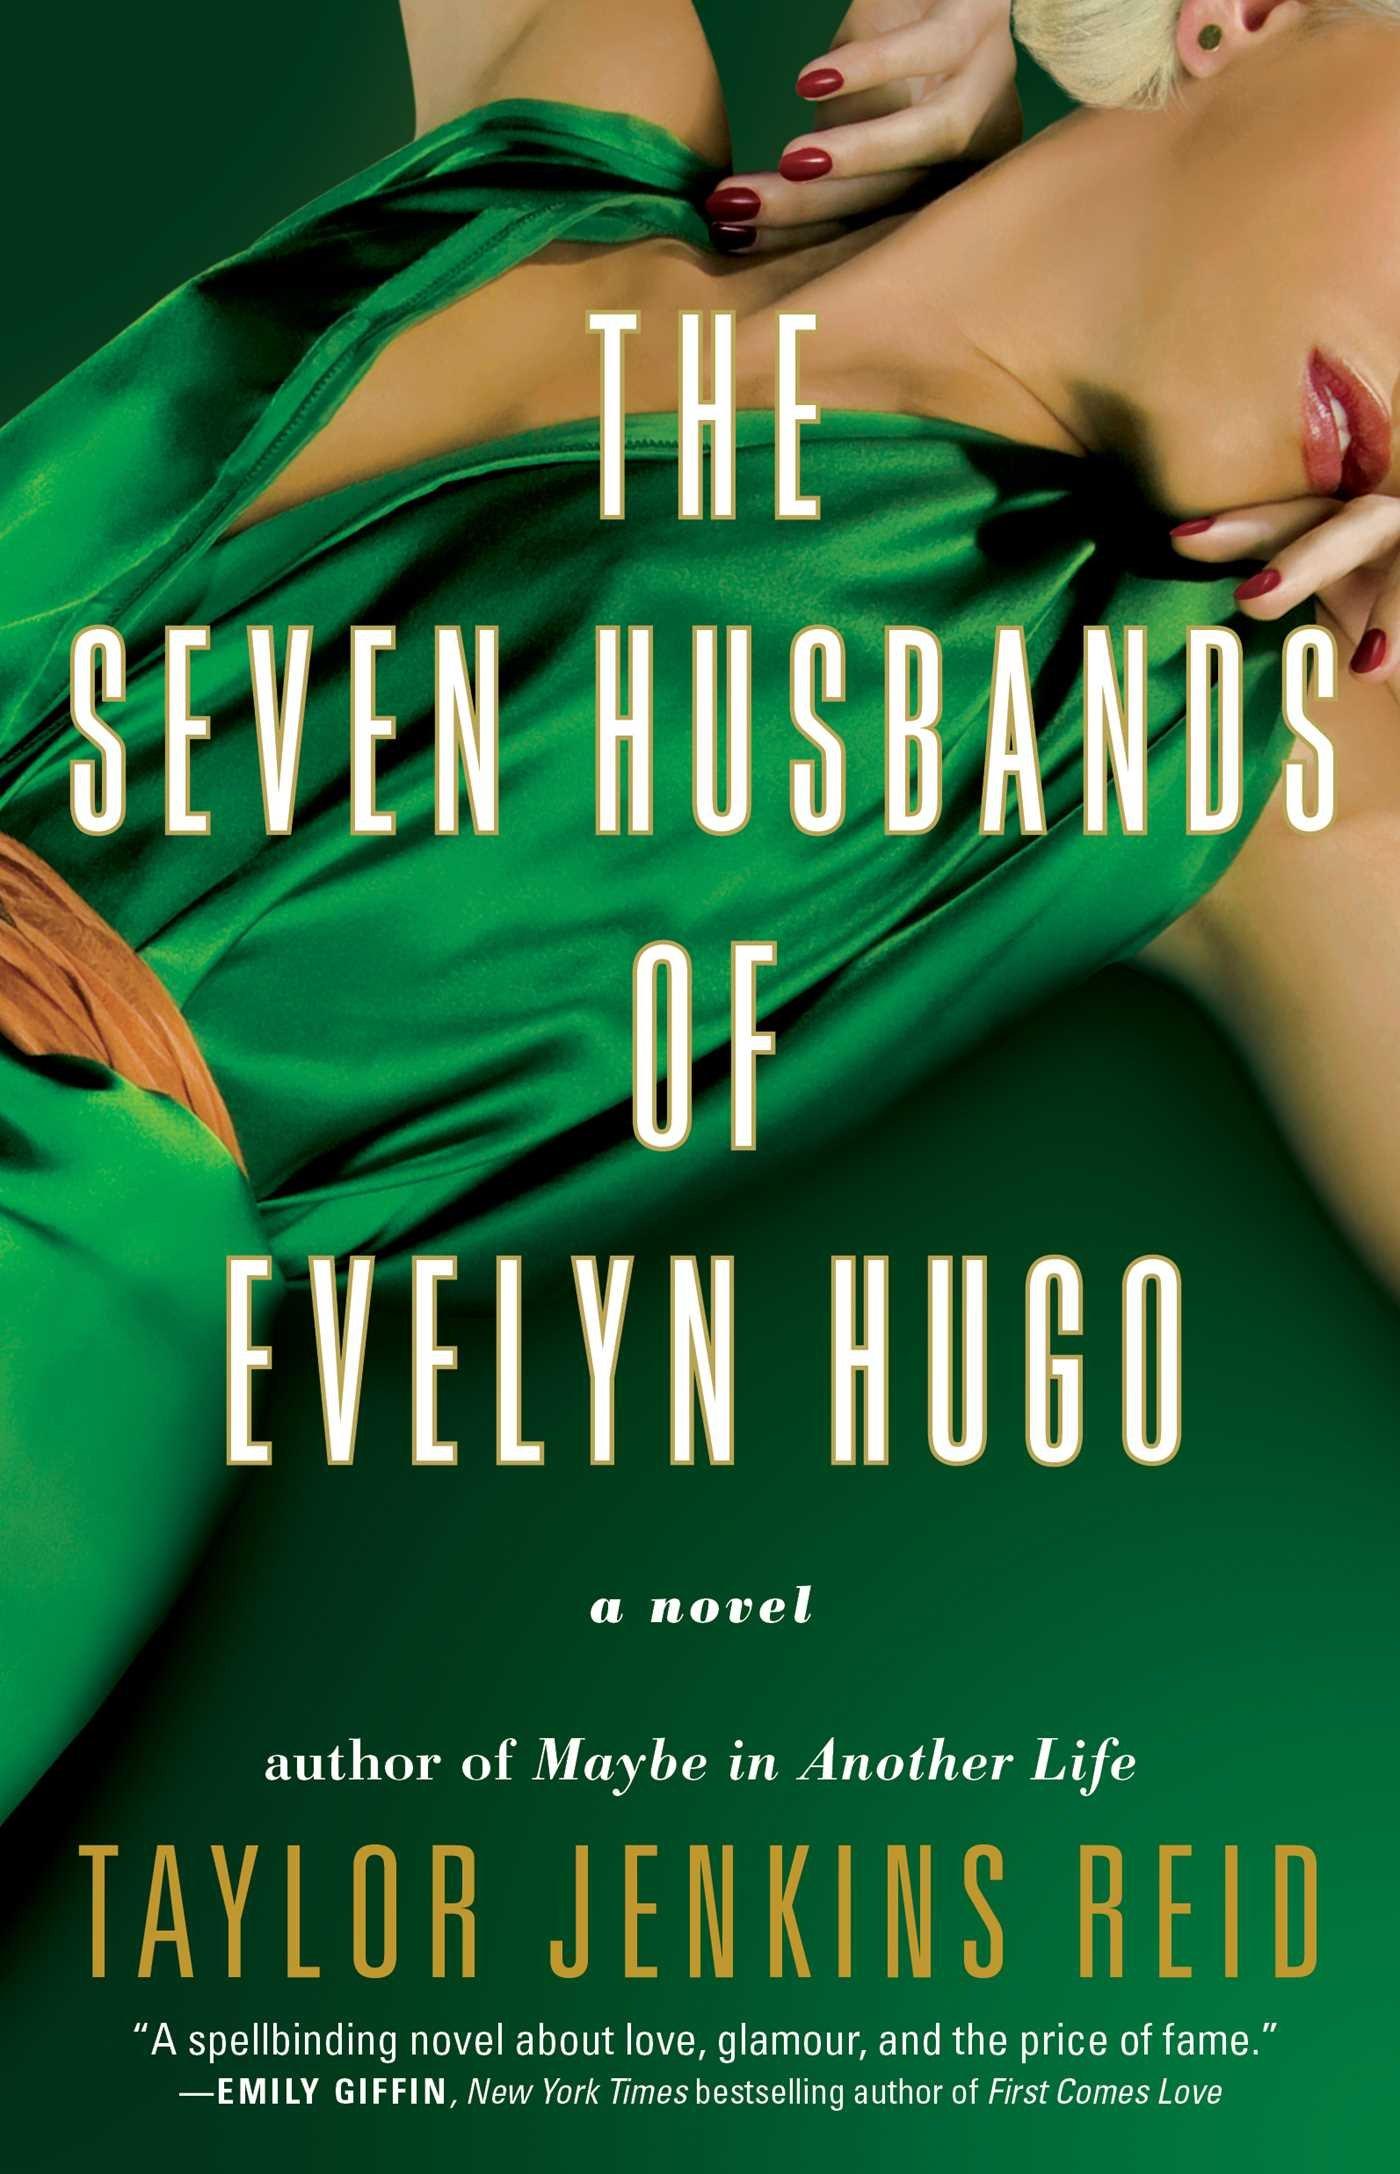 The Seven Husbands of Evelyn Hugo book cover